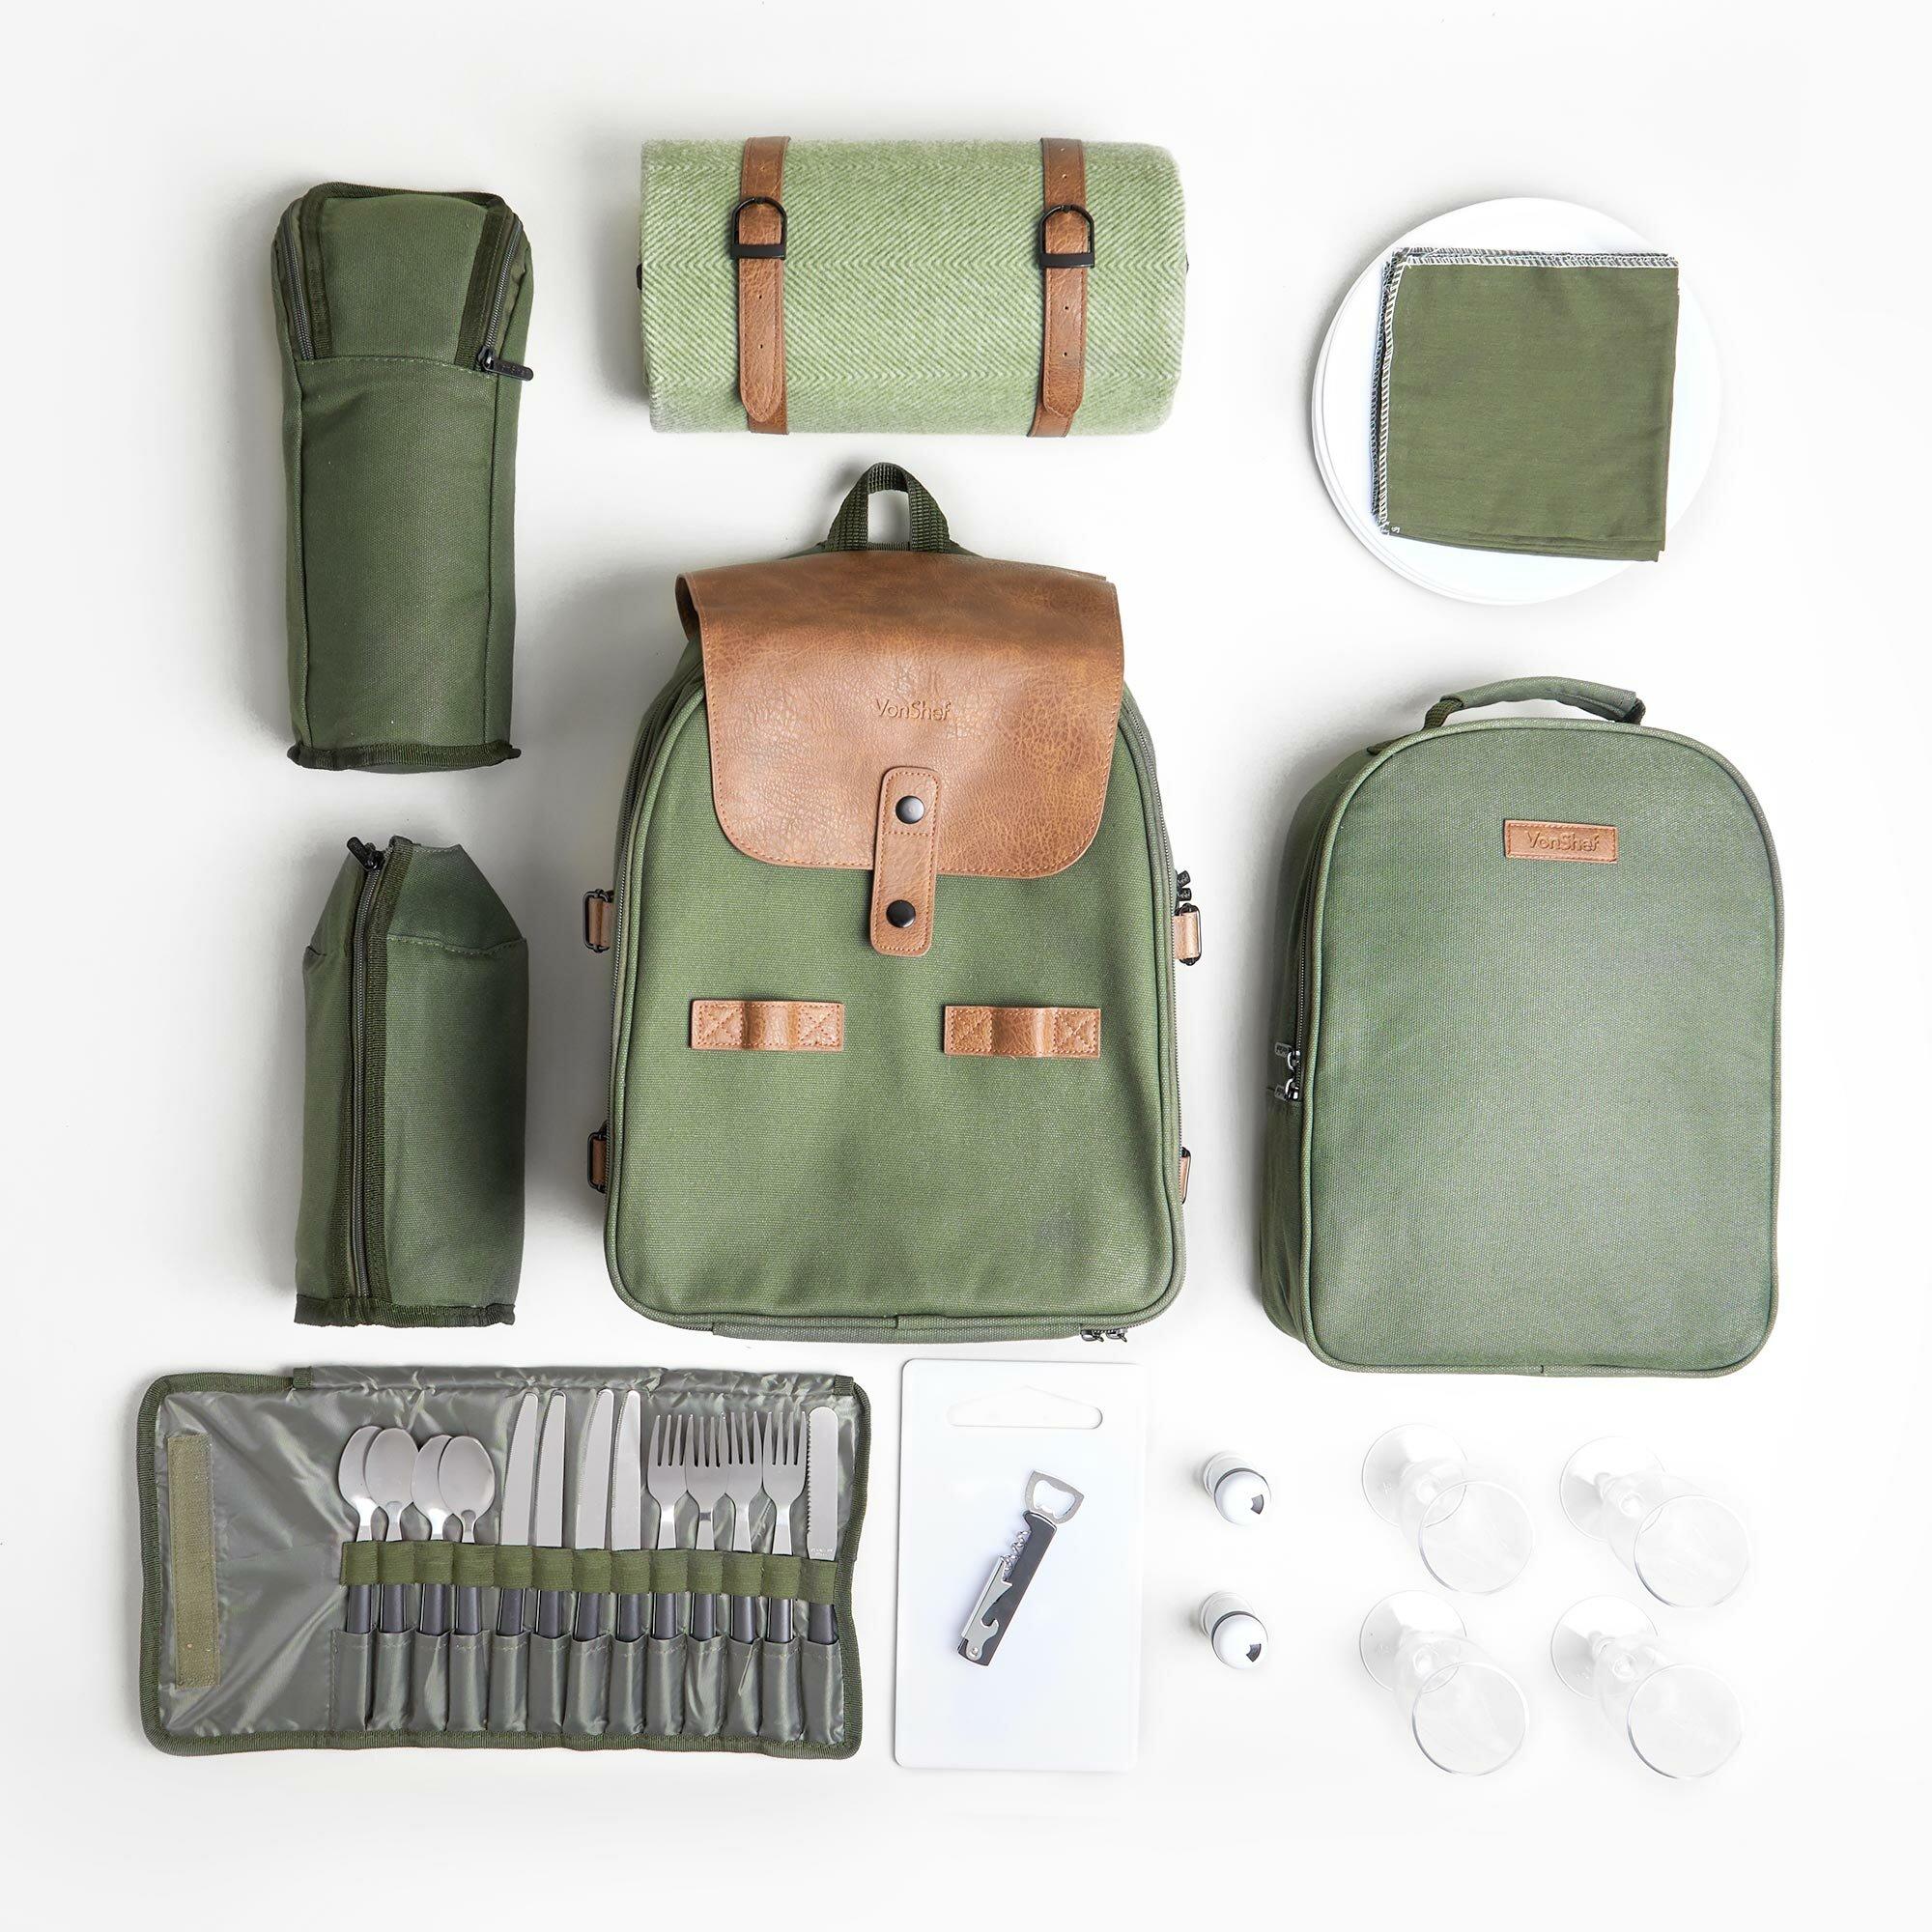 Vonshef Adventure Picnic Backpack Reviews Wayfair Co Uk